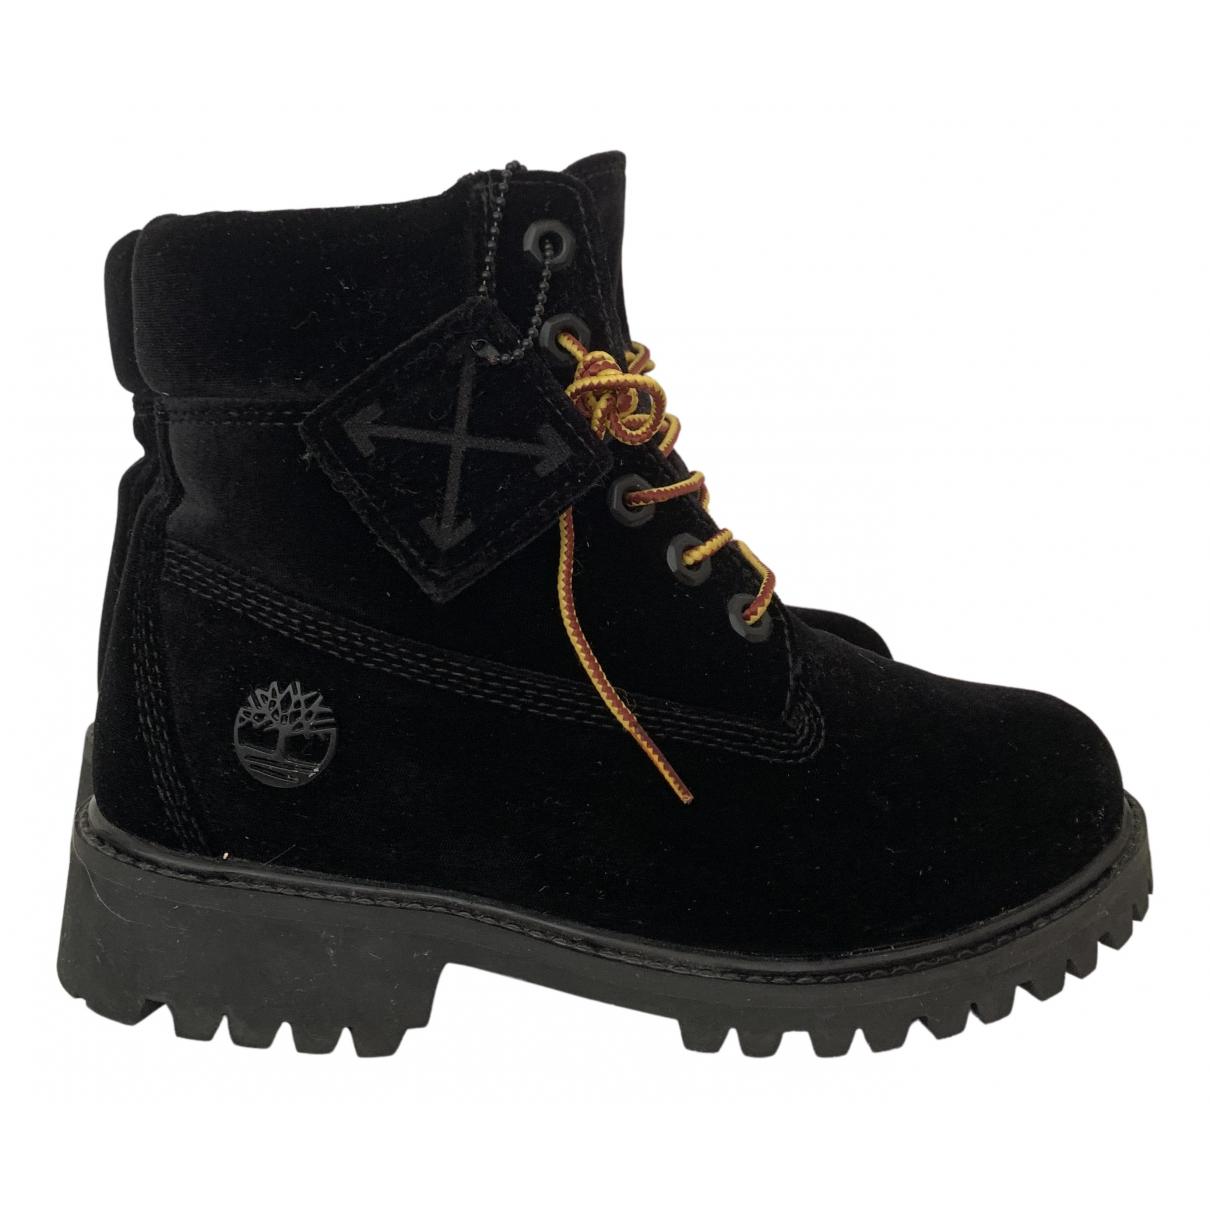 Timberland N Black Cloth Boots for Women 37 EU